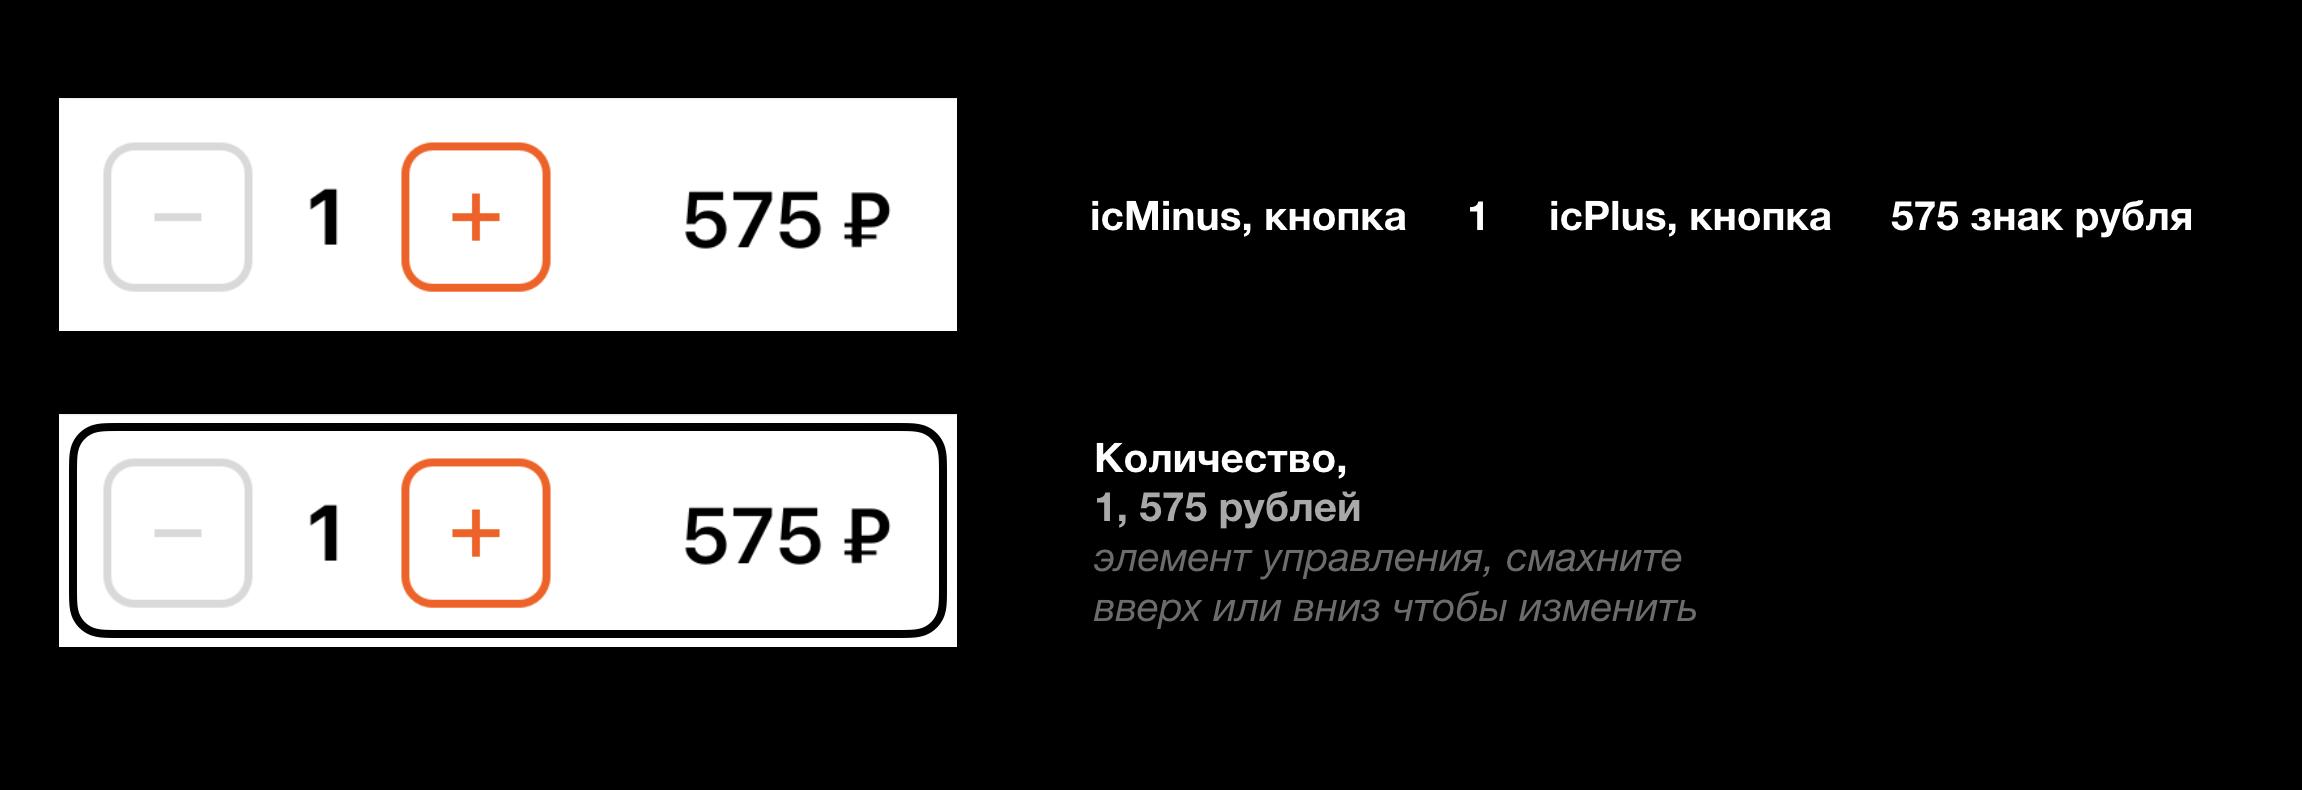 VoiceOver на iOS: каждый контрол ведёт себя по-разному - 7